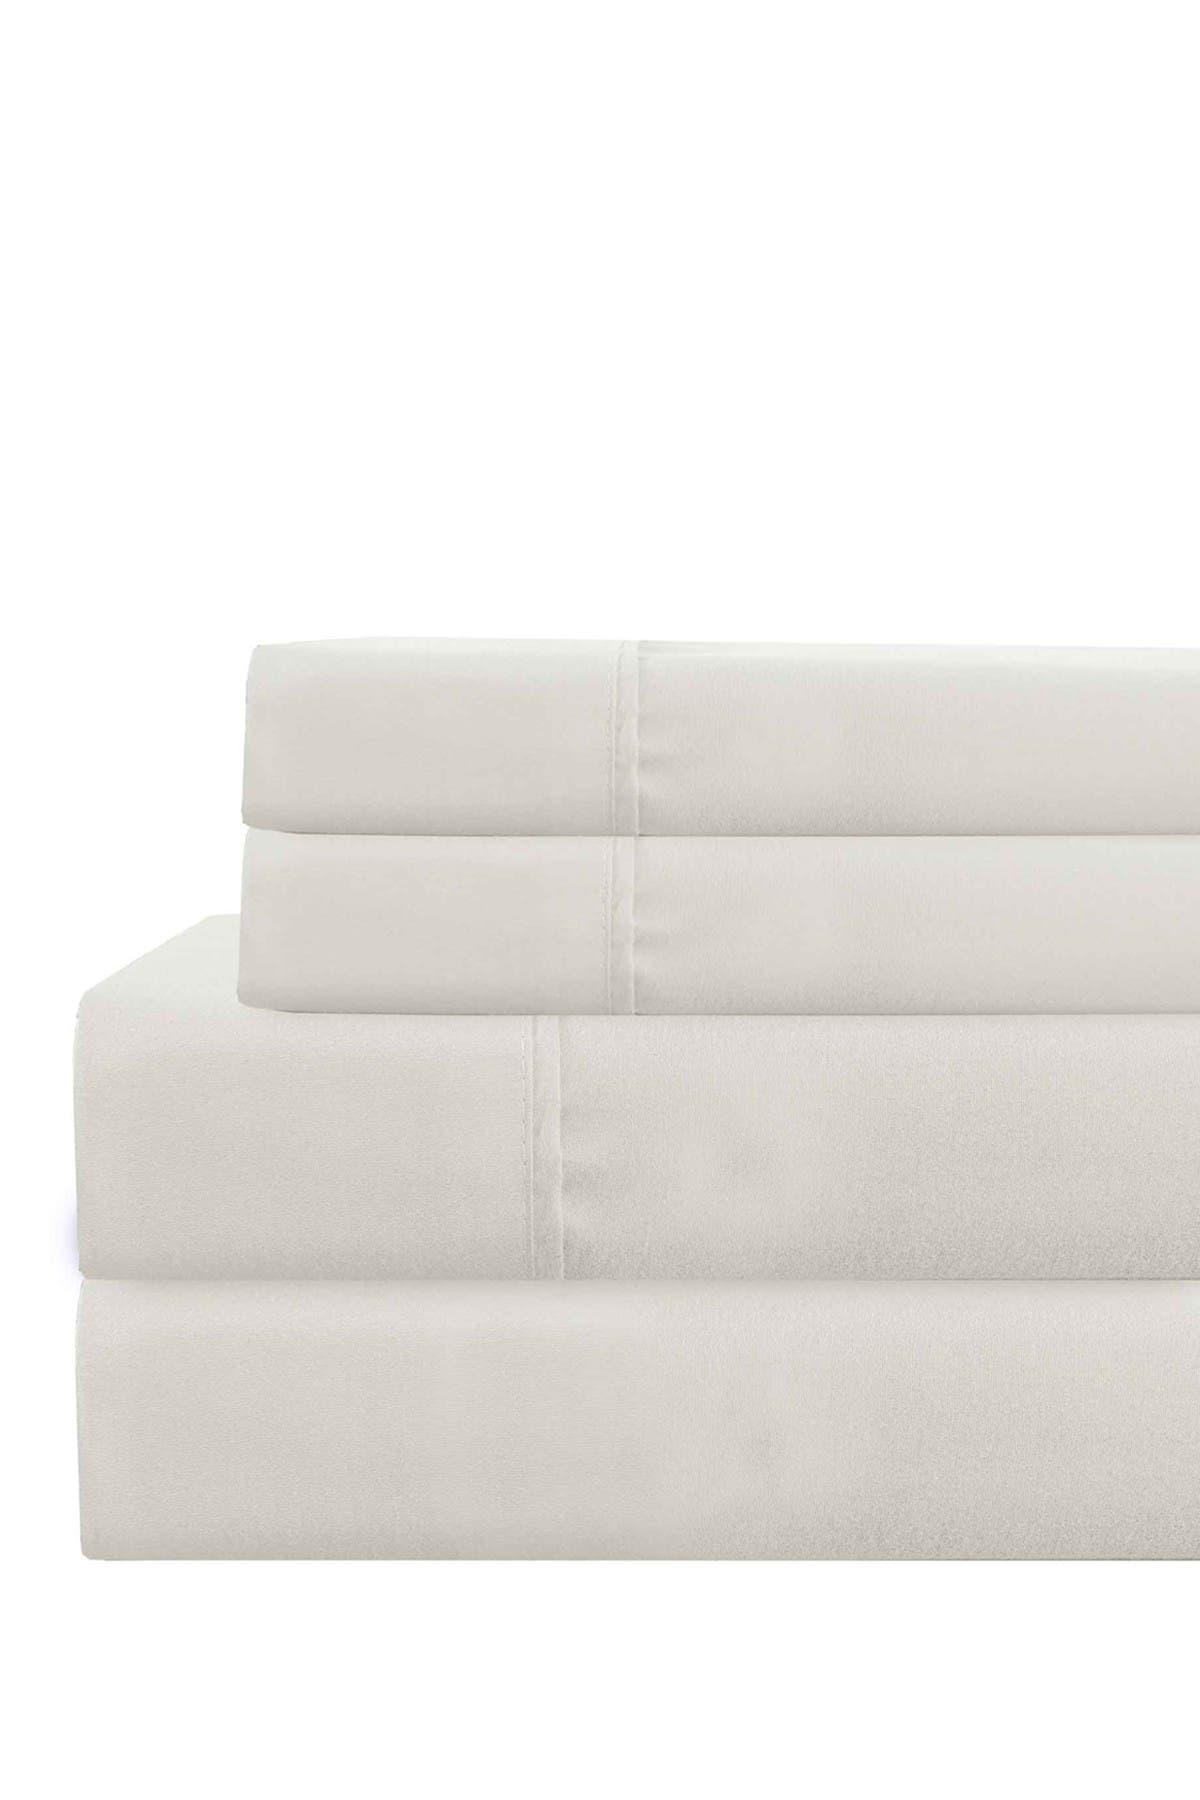 Image of Modern Threads Full Deep Pocket Ultra Soft Solid Sheet Set - White